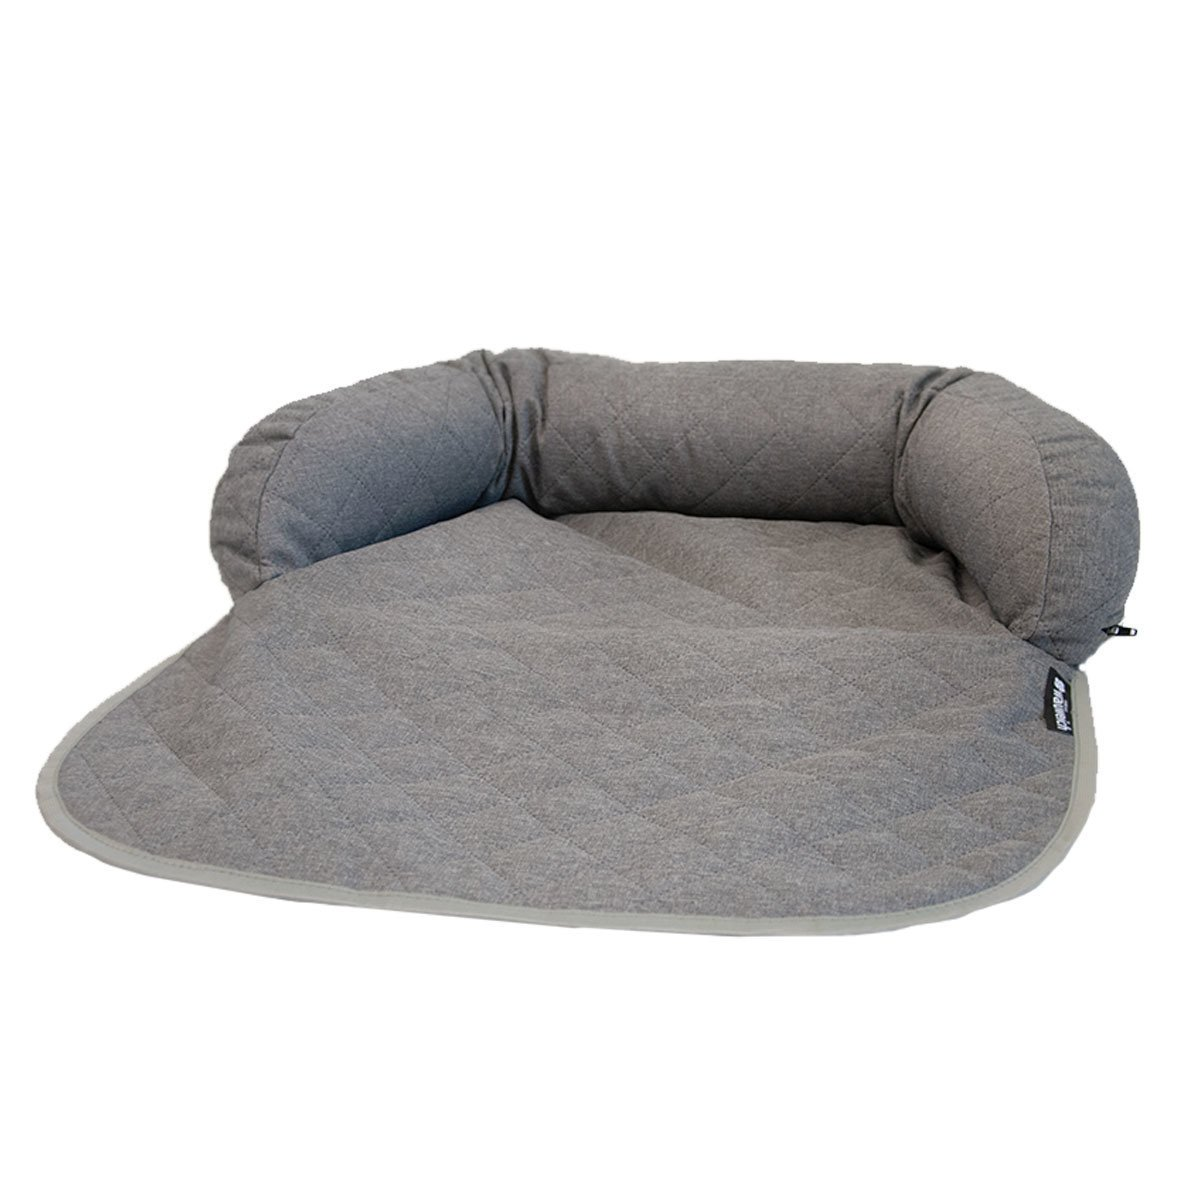 wauweich Sofa Hundebett Hundedecke, Bild 3